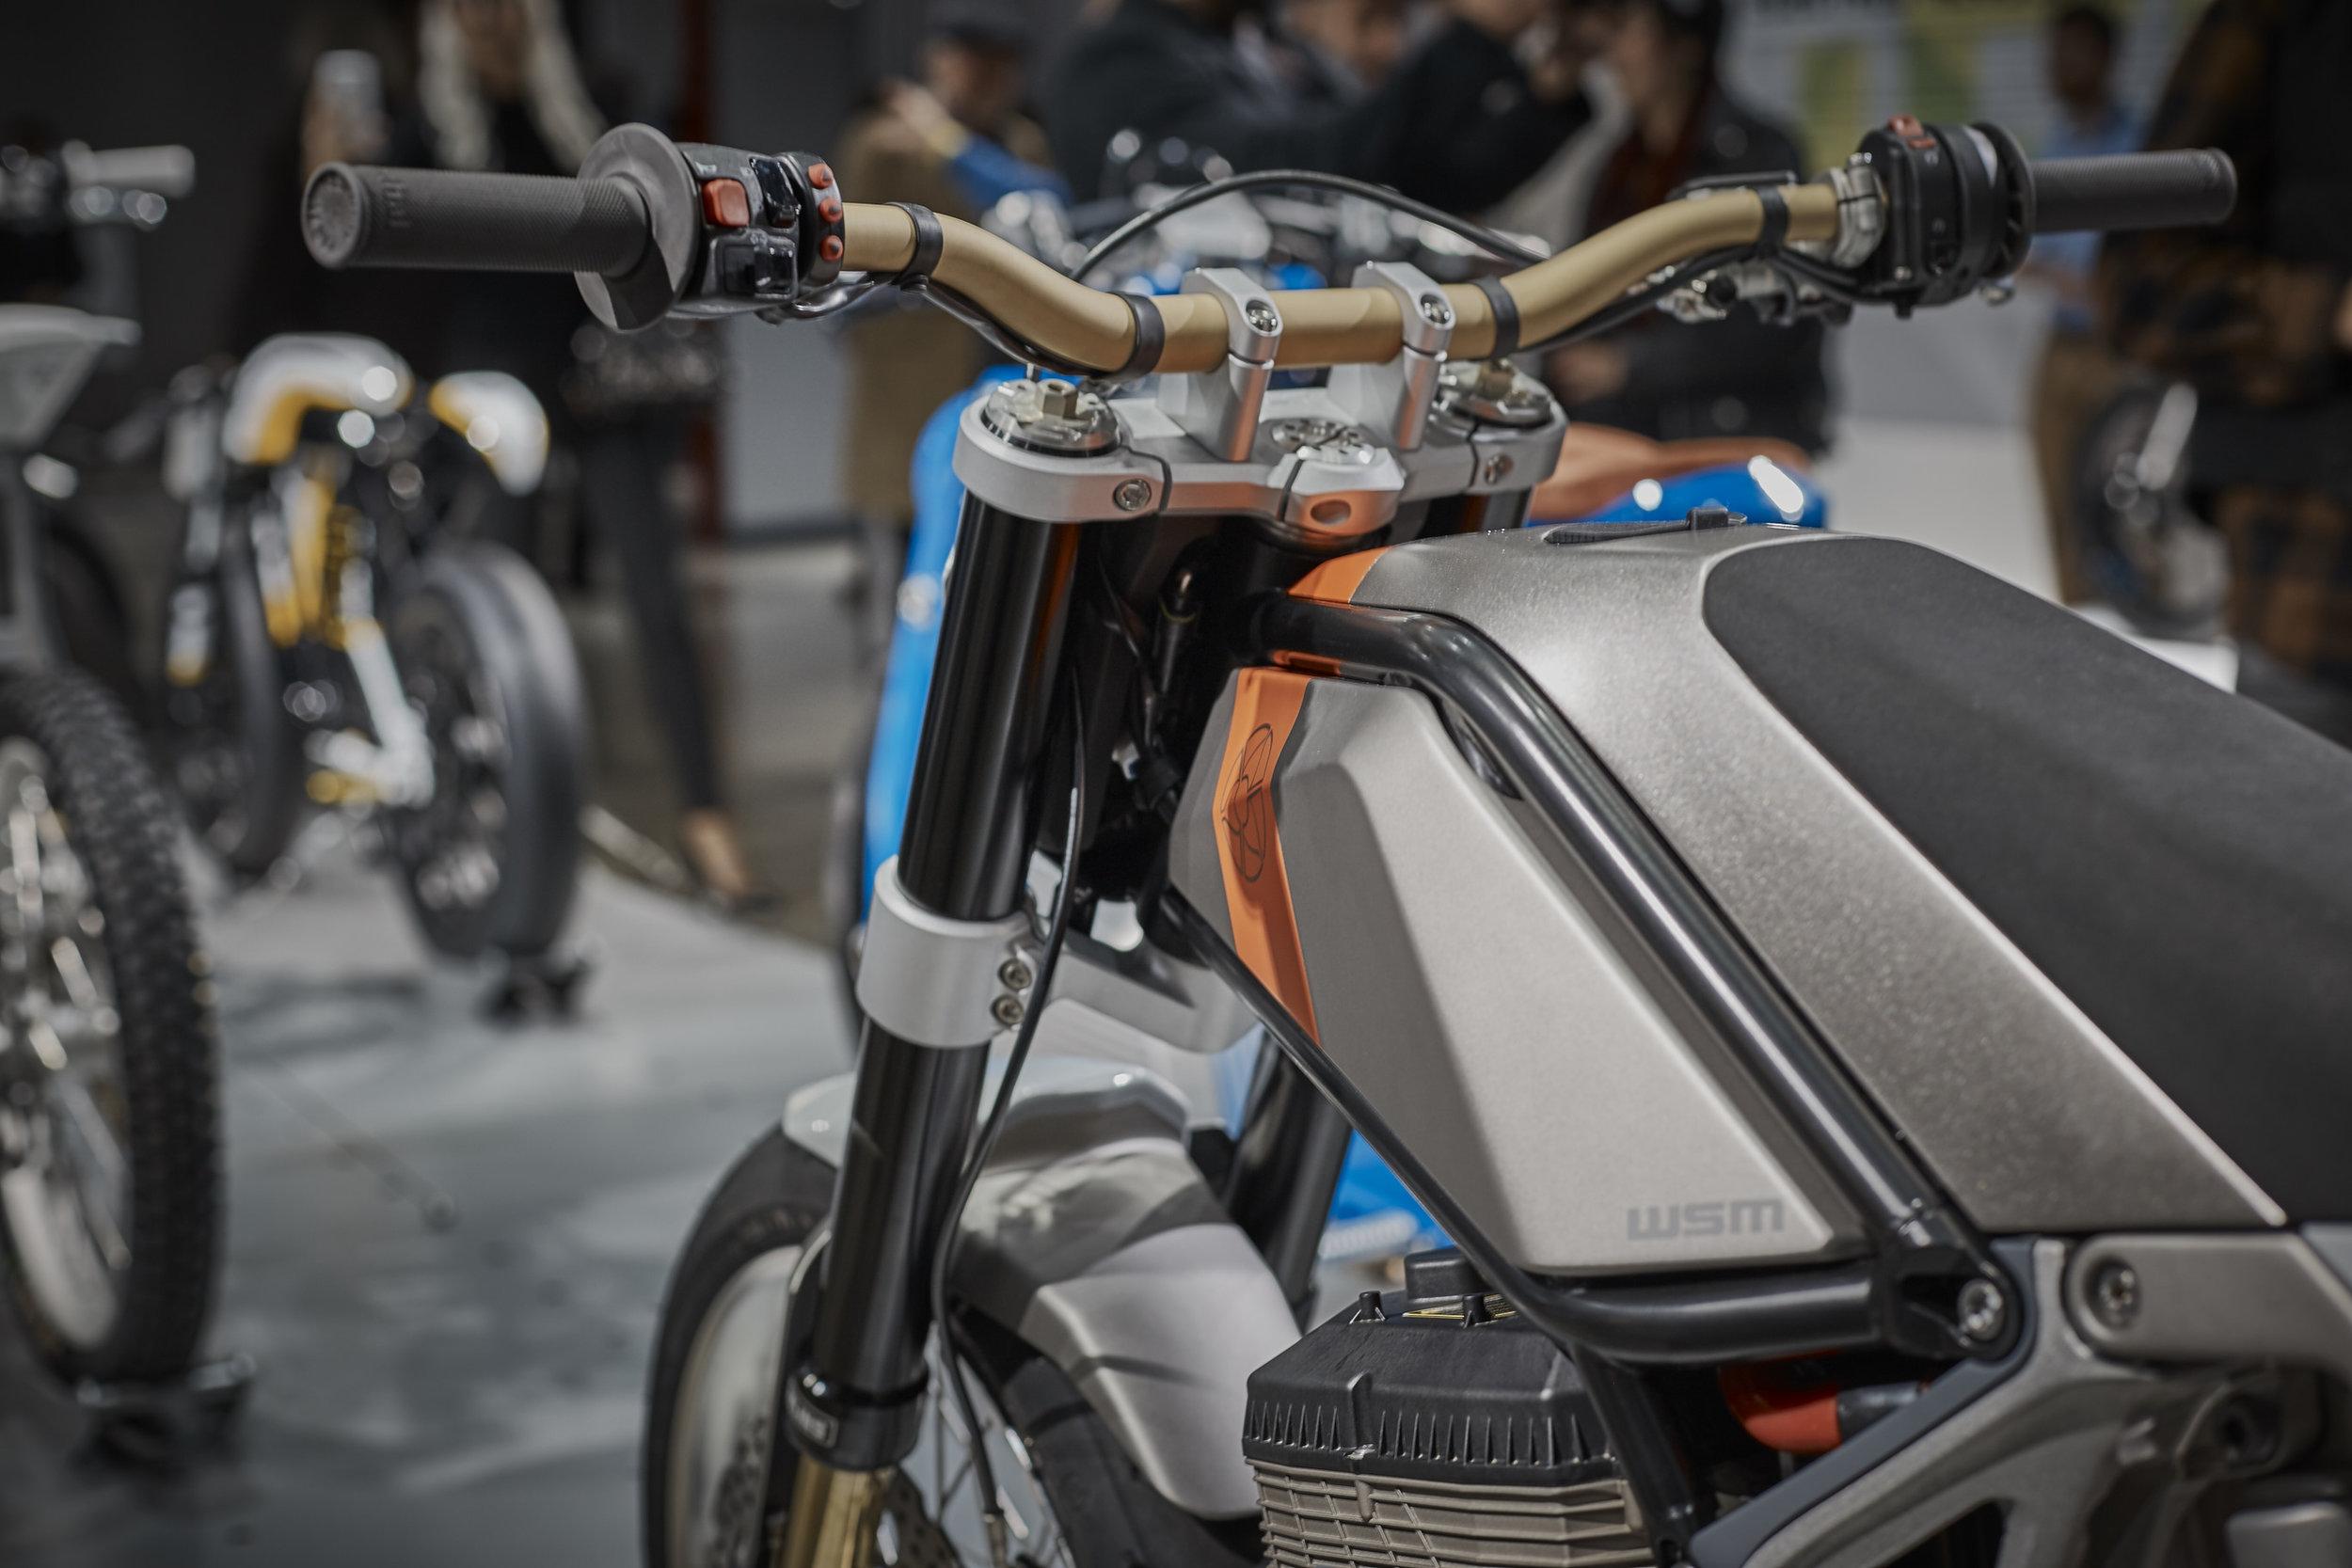 Petersen electric bikes 4.jpg